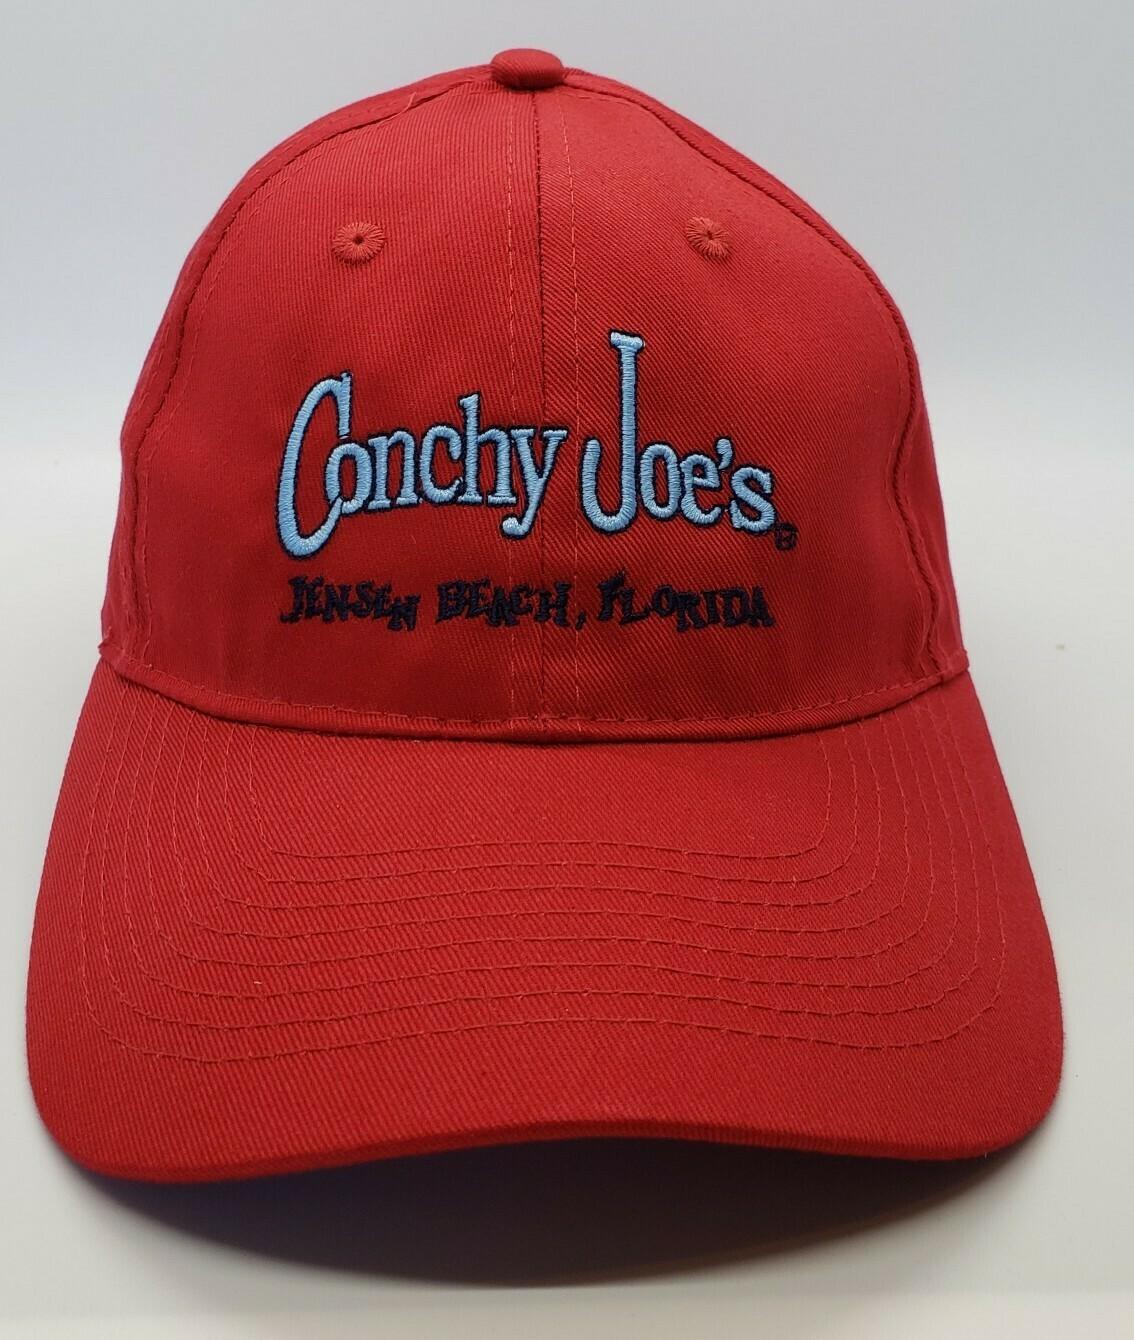 Cj's Red Adjustable Baseball Cap